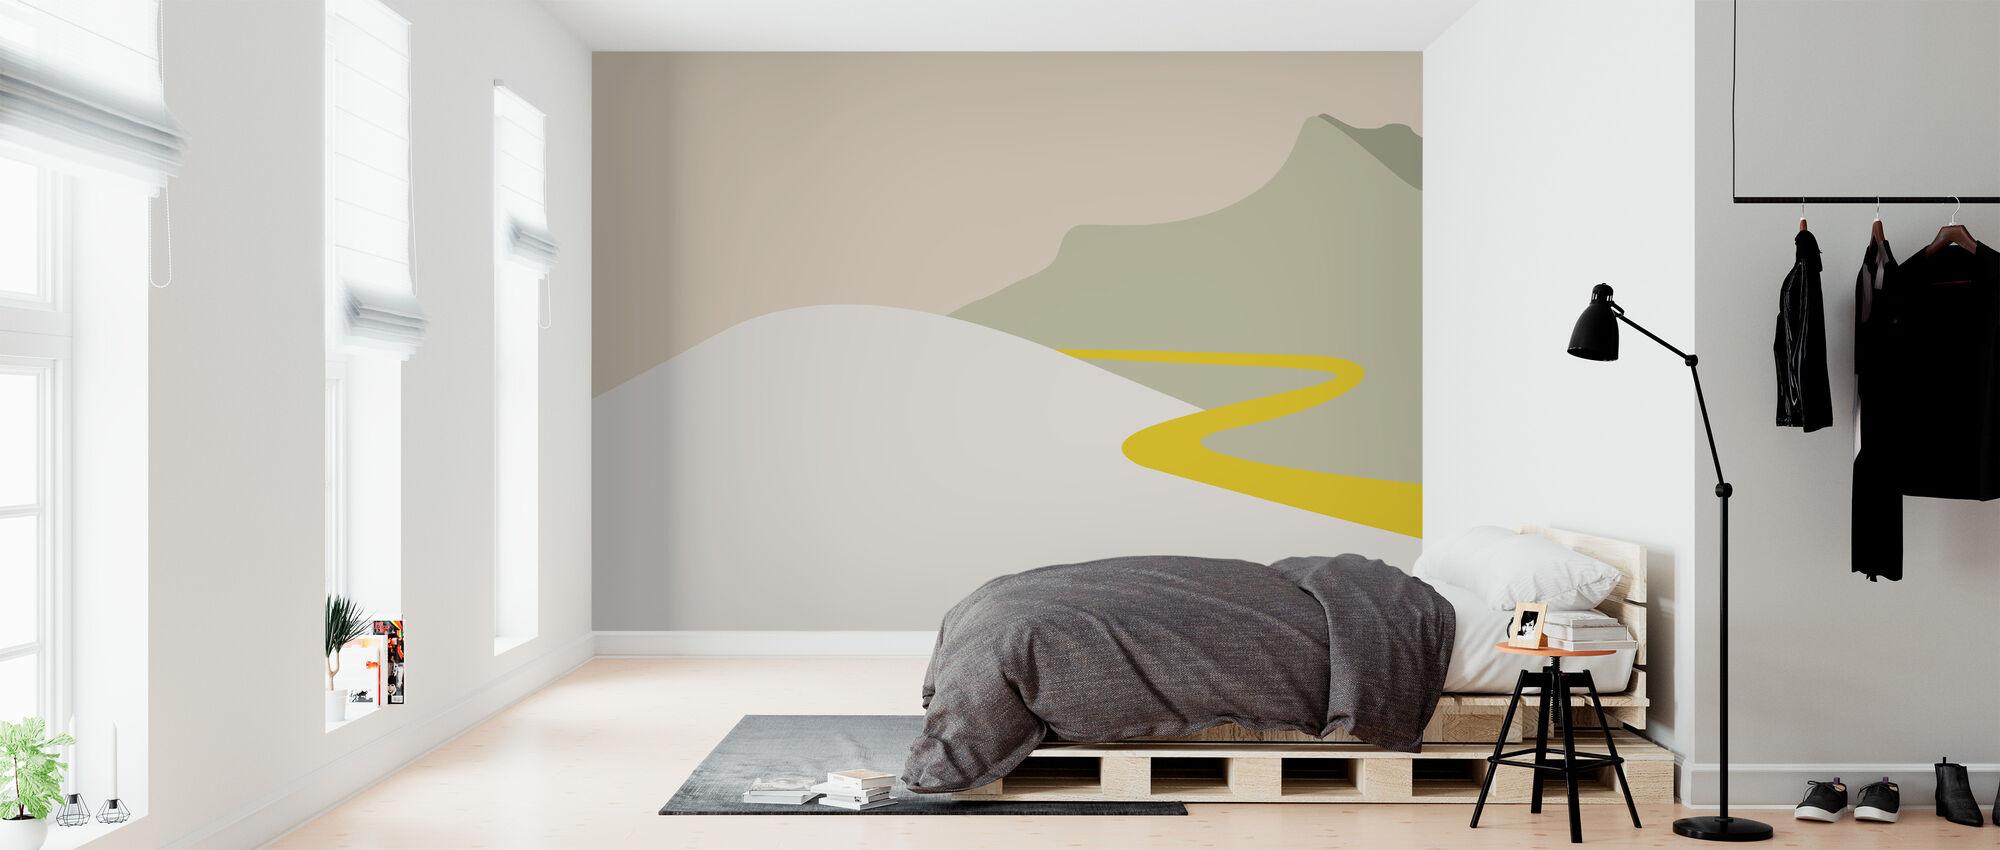 I travel - Wallpaper - Bedroom